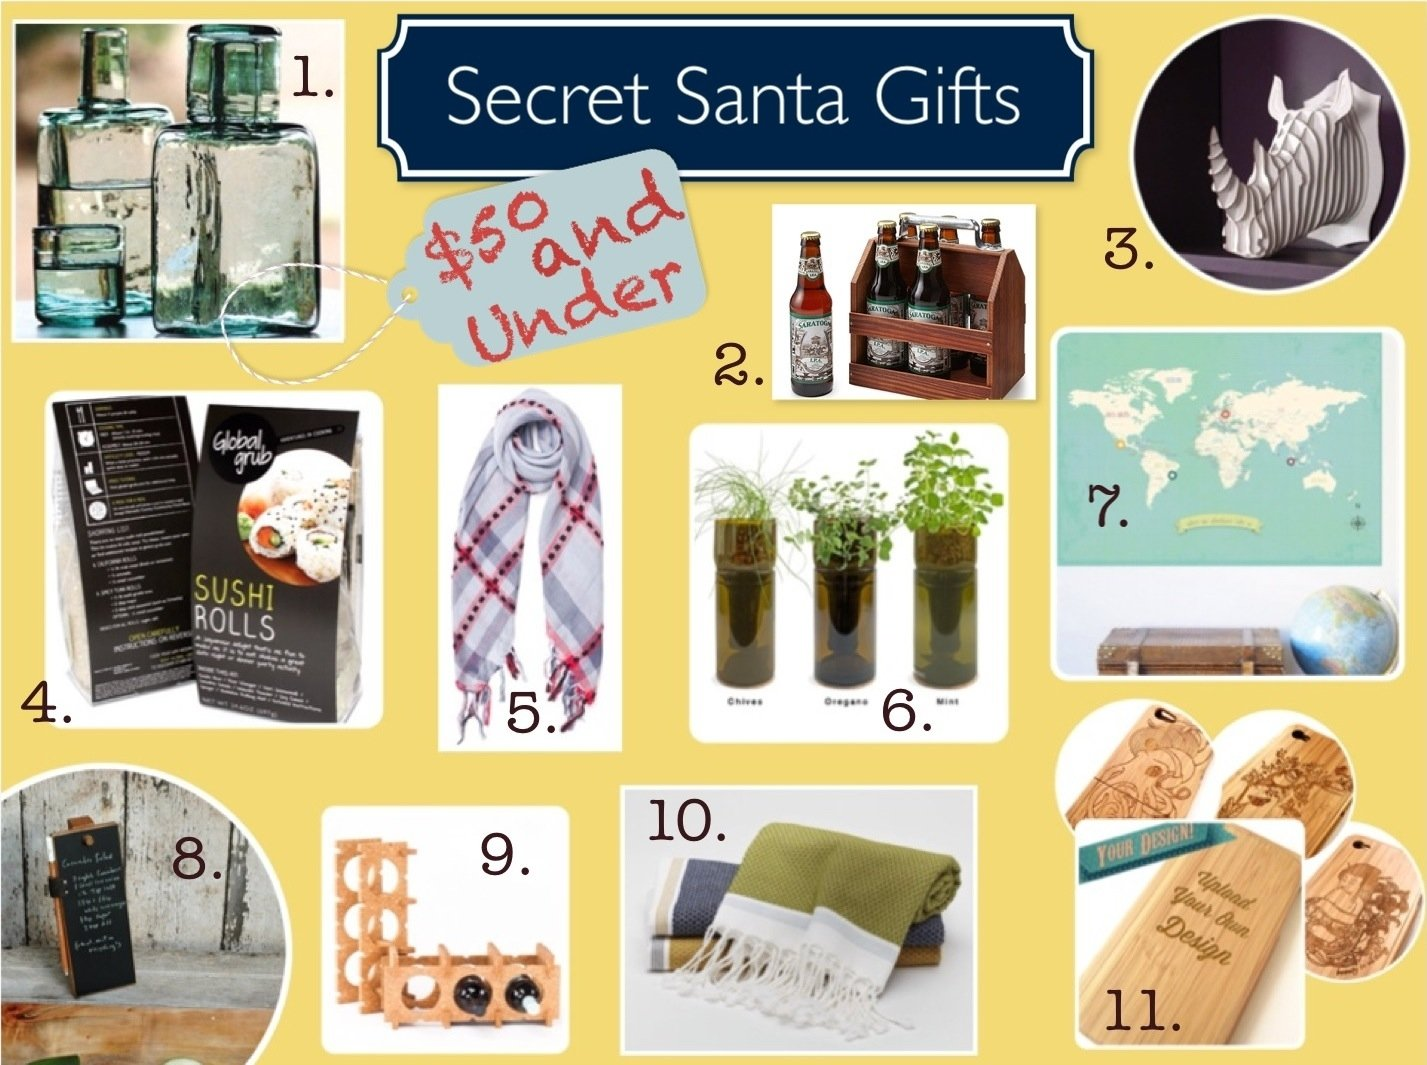 10 Wonderful Secret Santa Gift Ideas For Men ethical secret santa gifts under 50 made to travel 2020